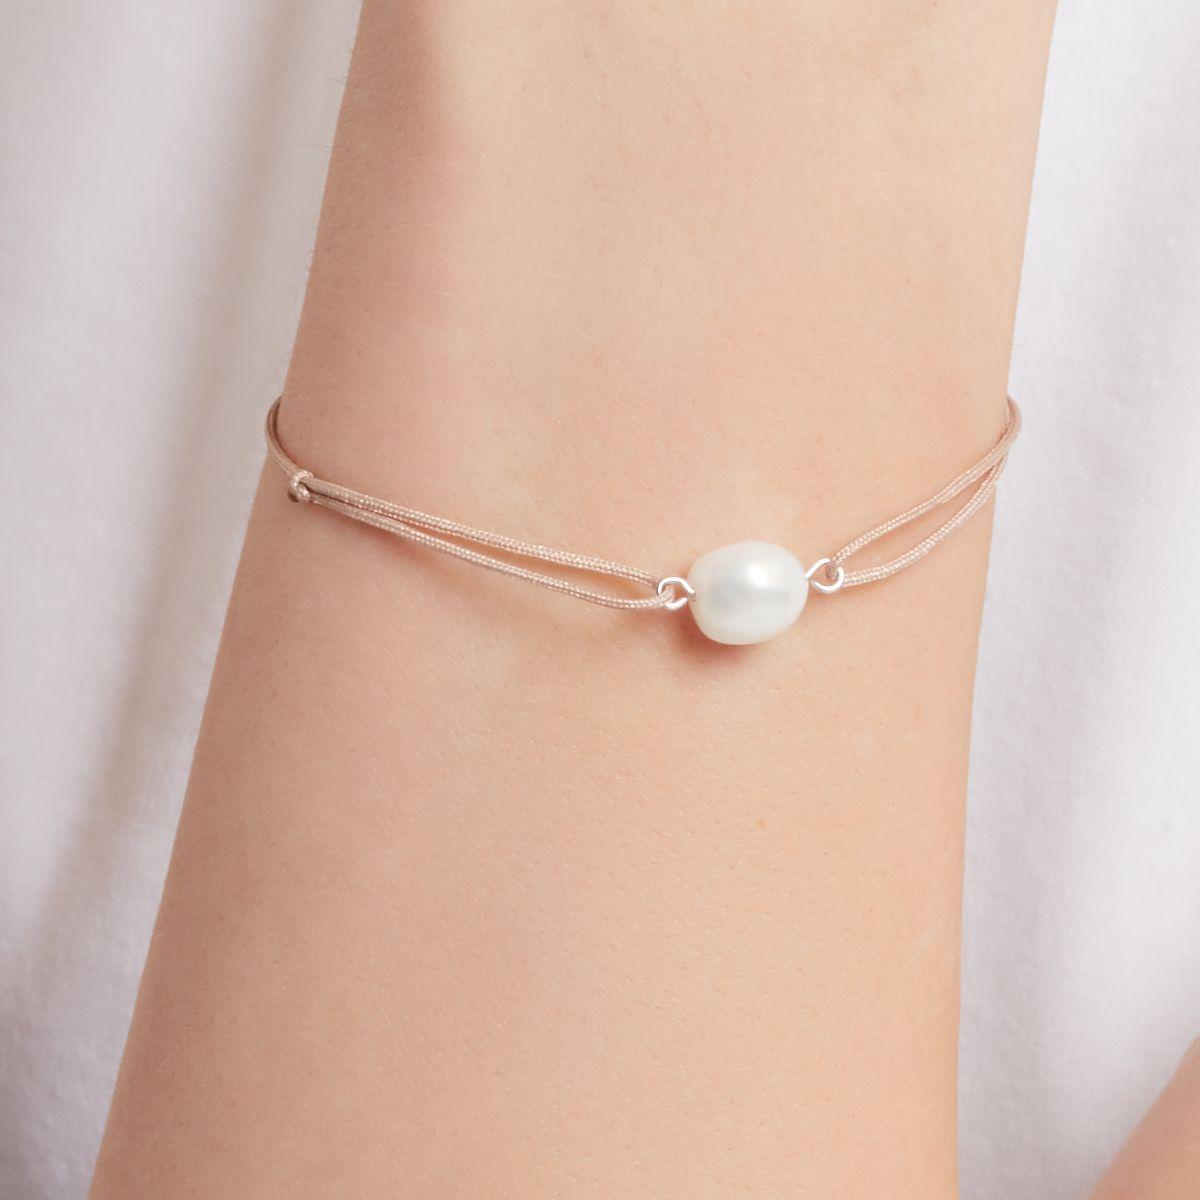 Ariel - Armband - Hellgrau